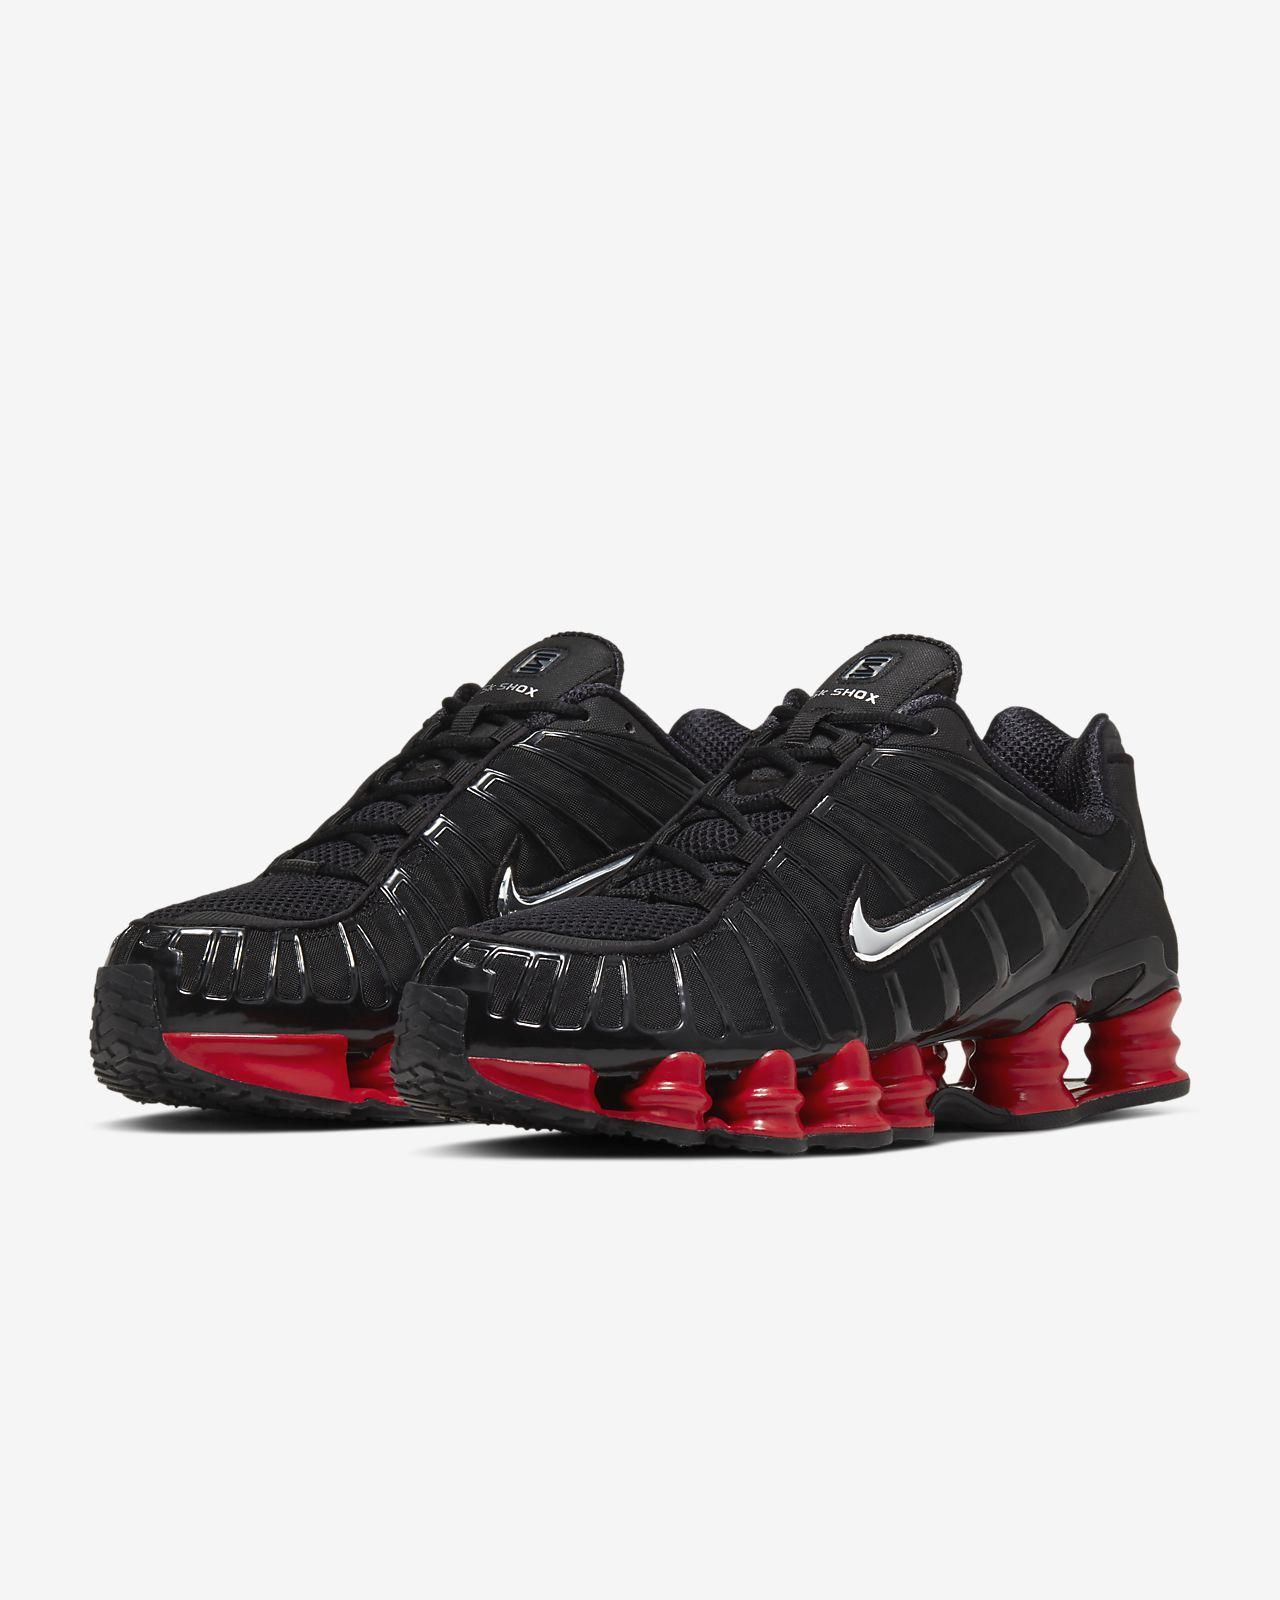 Nike x Skepta Shox TL Shoe